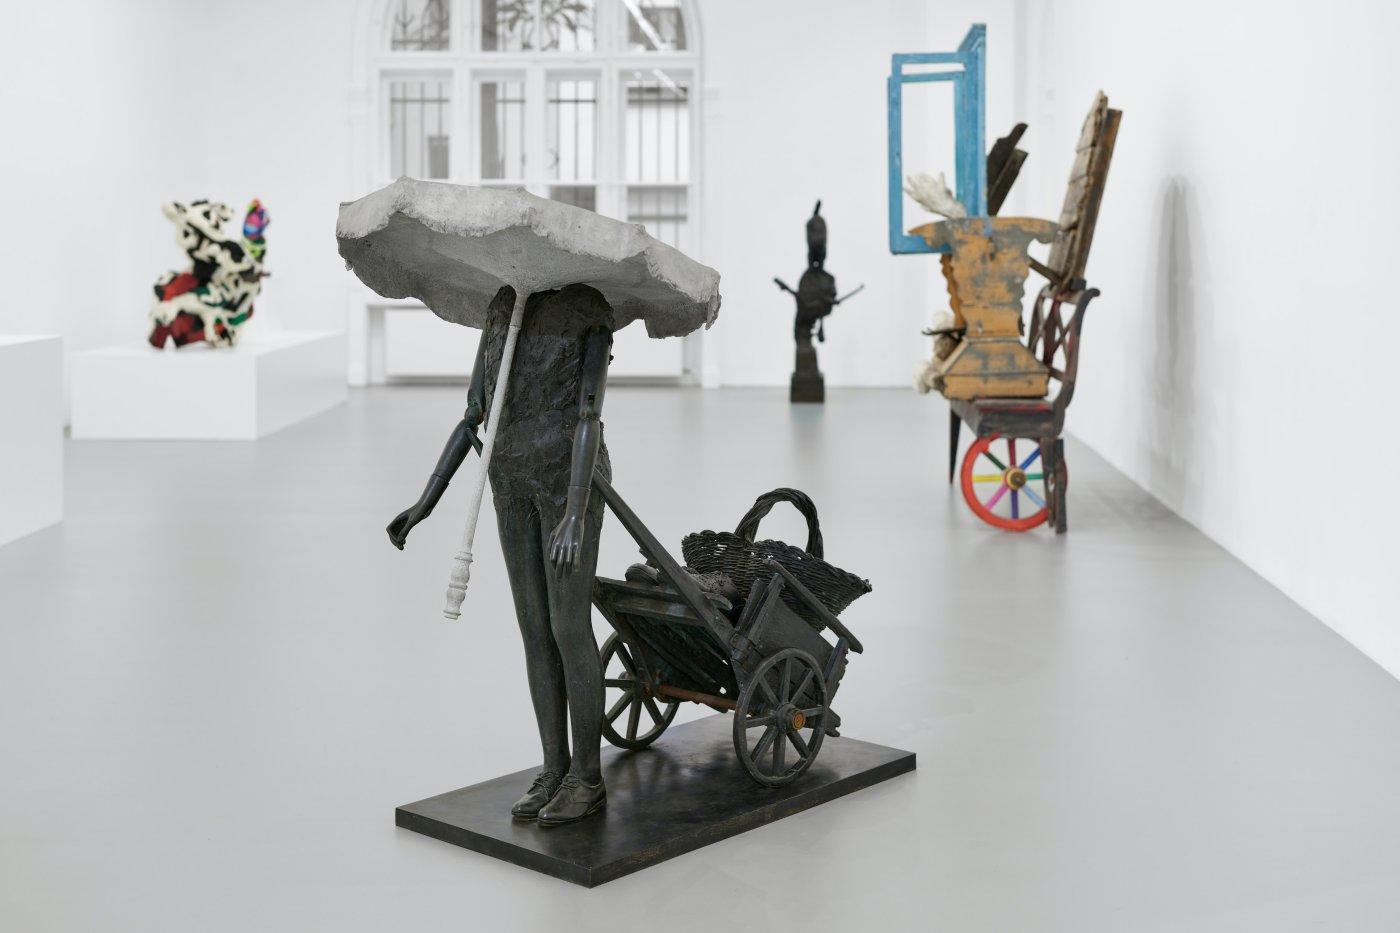 Galerie Max Hetzler Goethestrasse Karel Appel 14